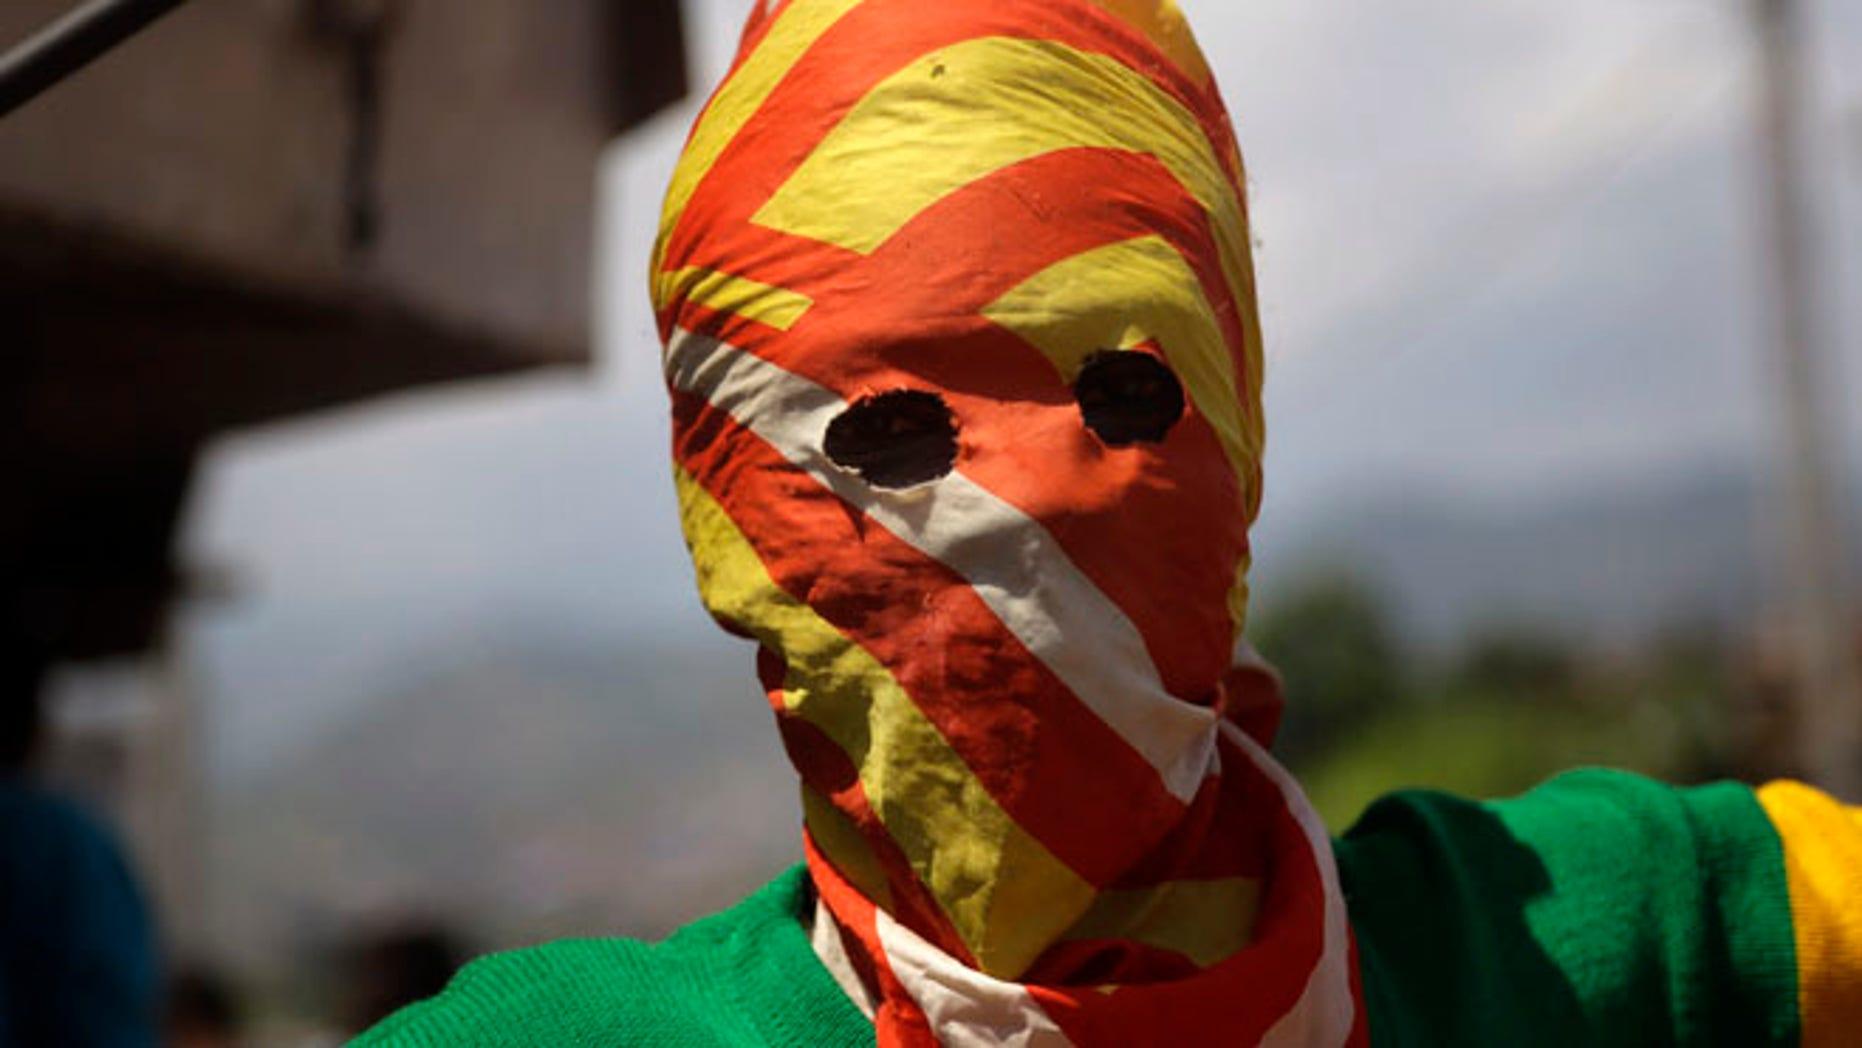 May 21, 2015: A masked Protester waits for  police during clashes in the Nyakabyga neighborhood of Bujumbura, Burundi. (AP)